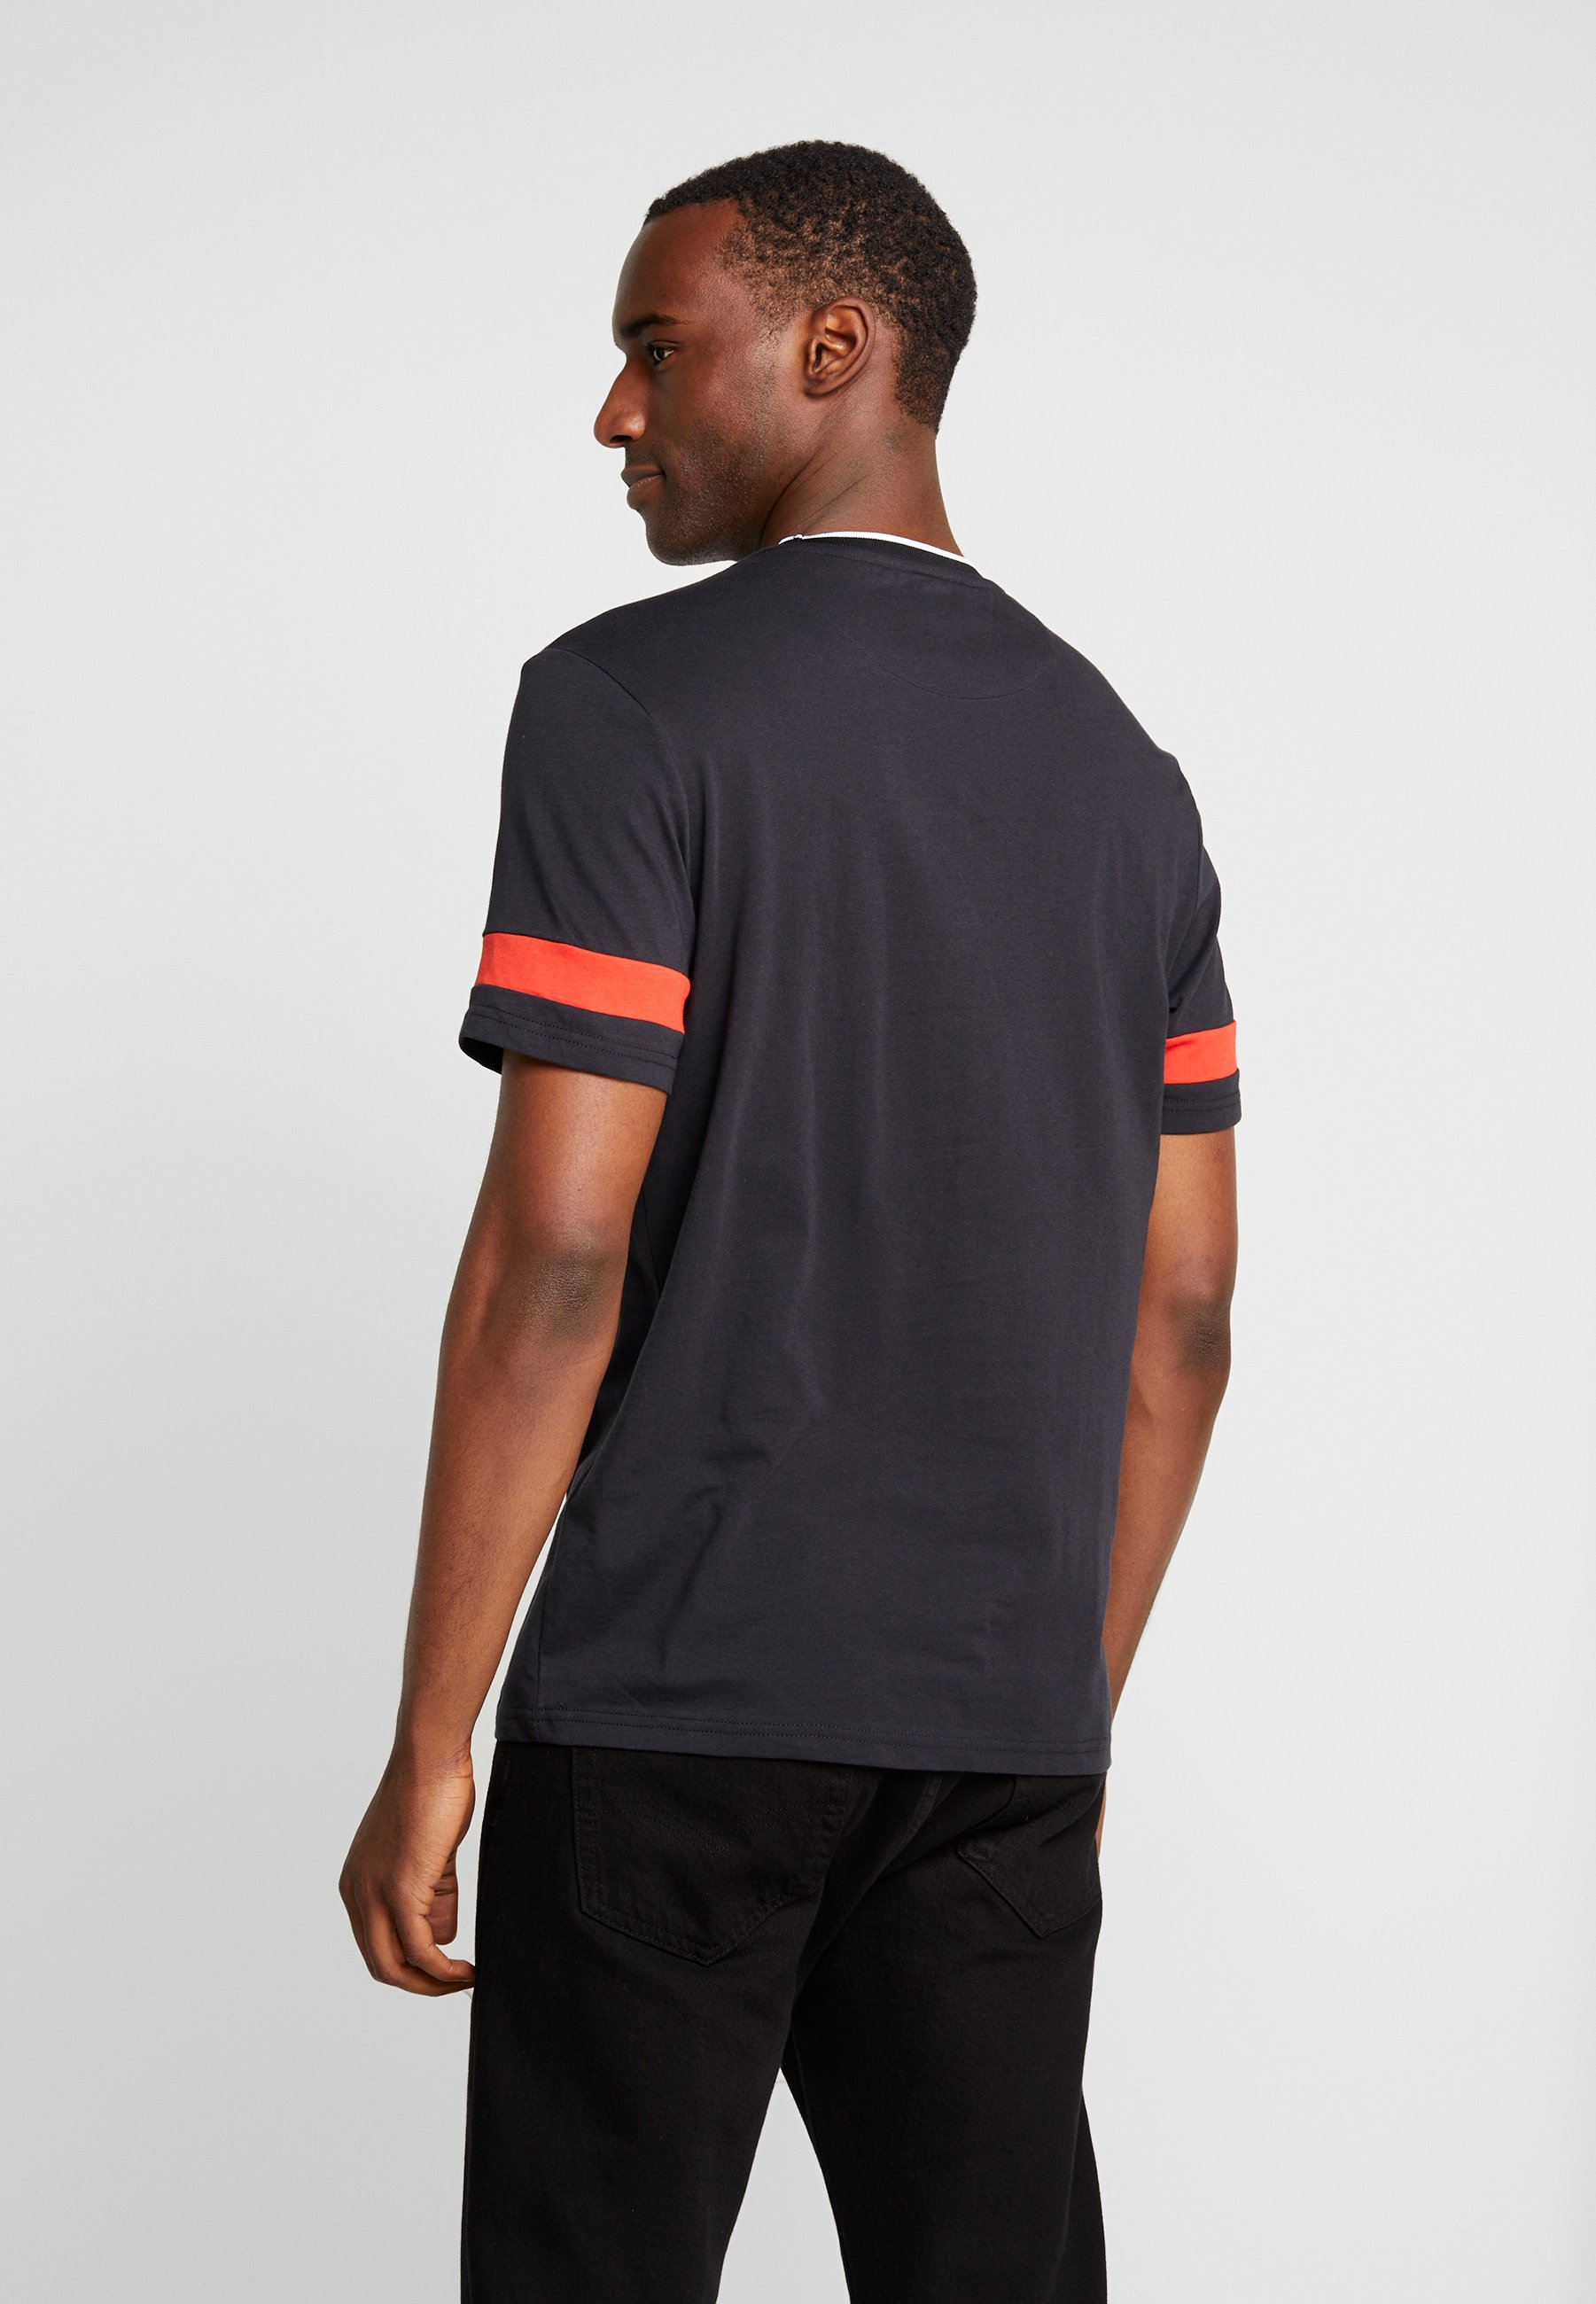 shirt TippedT Black Lyleamp; Basique True Scott sQthdCr